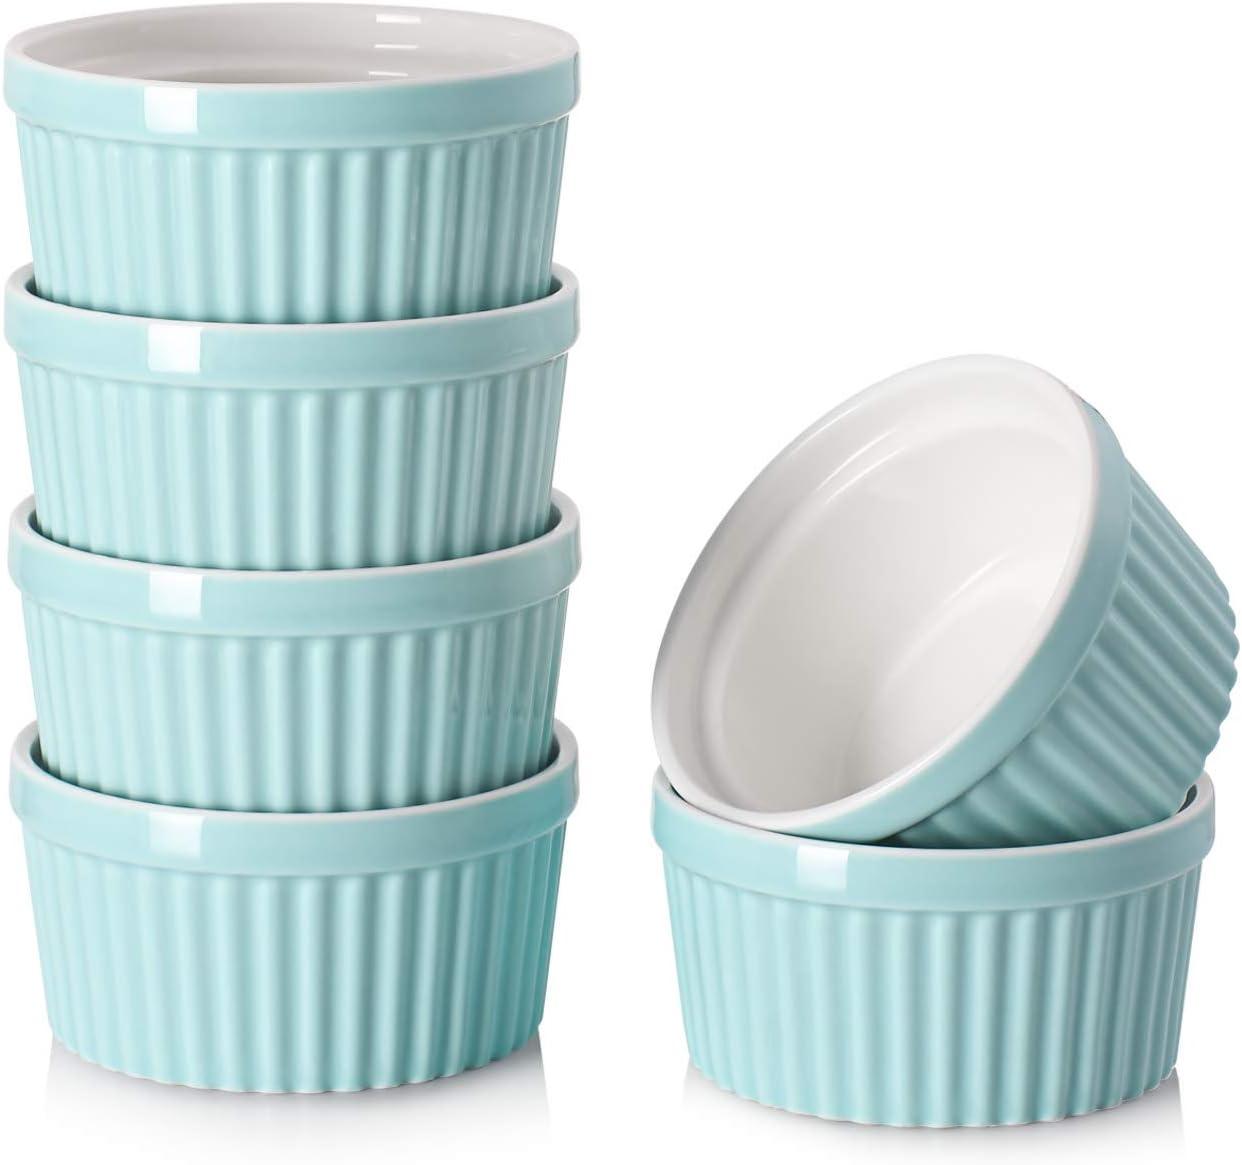 DOWAN 4 Oz Porcelain Ramekins - Souffle Dish Ramekins for Creme Brulee Pudding Oven Safe, Classic Style Ramekins Bowls for Baking, Set of 6, Blue